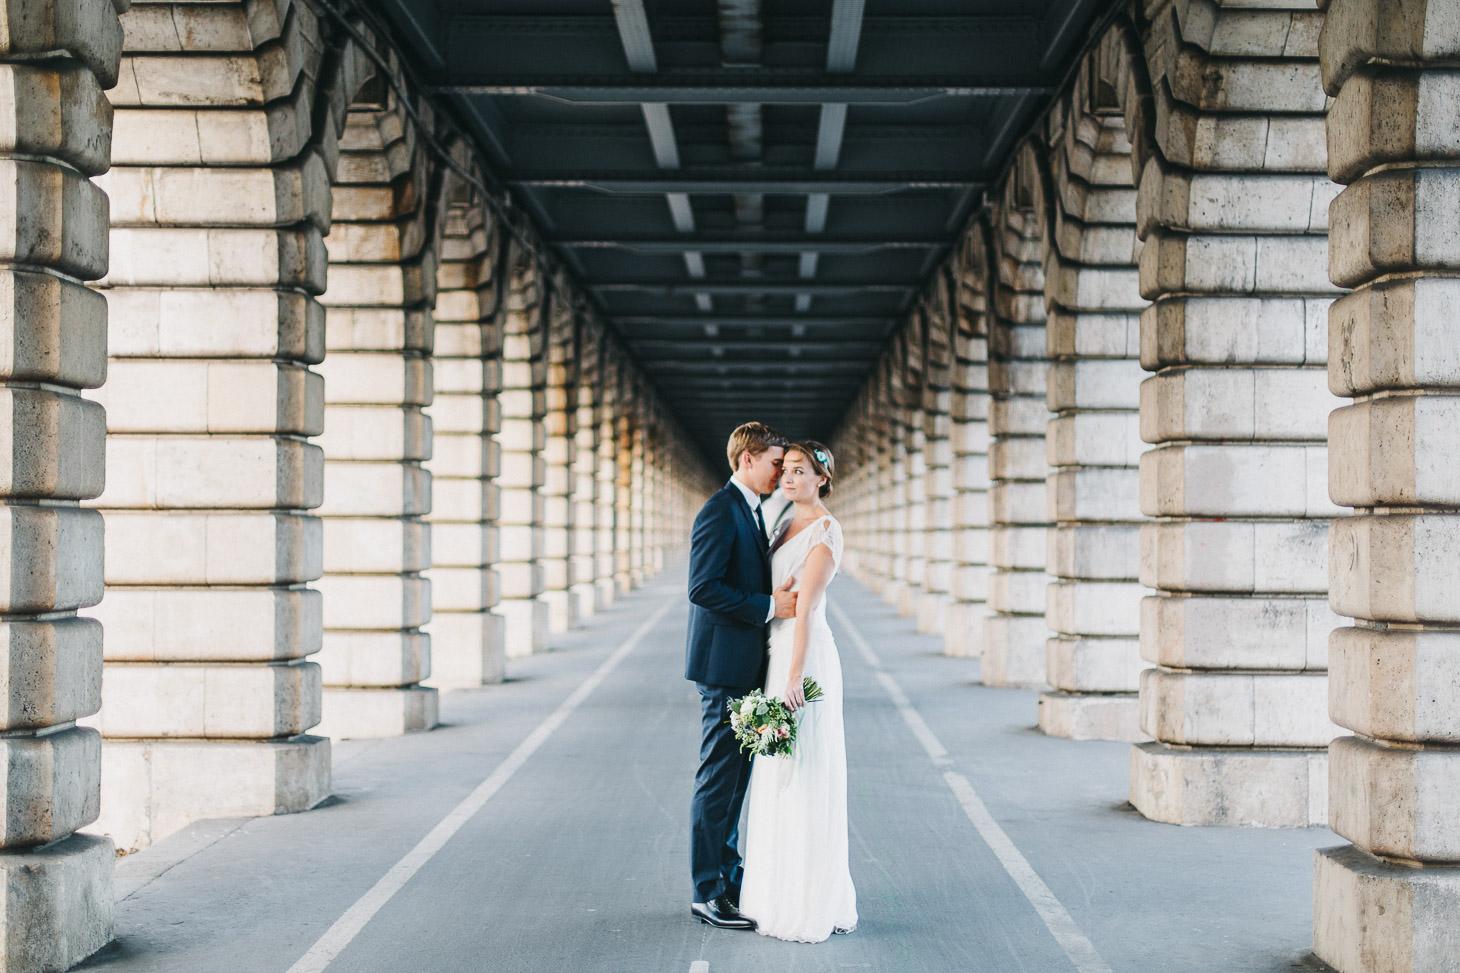 foodtruck_mariage_paris-02